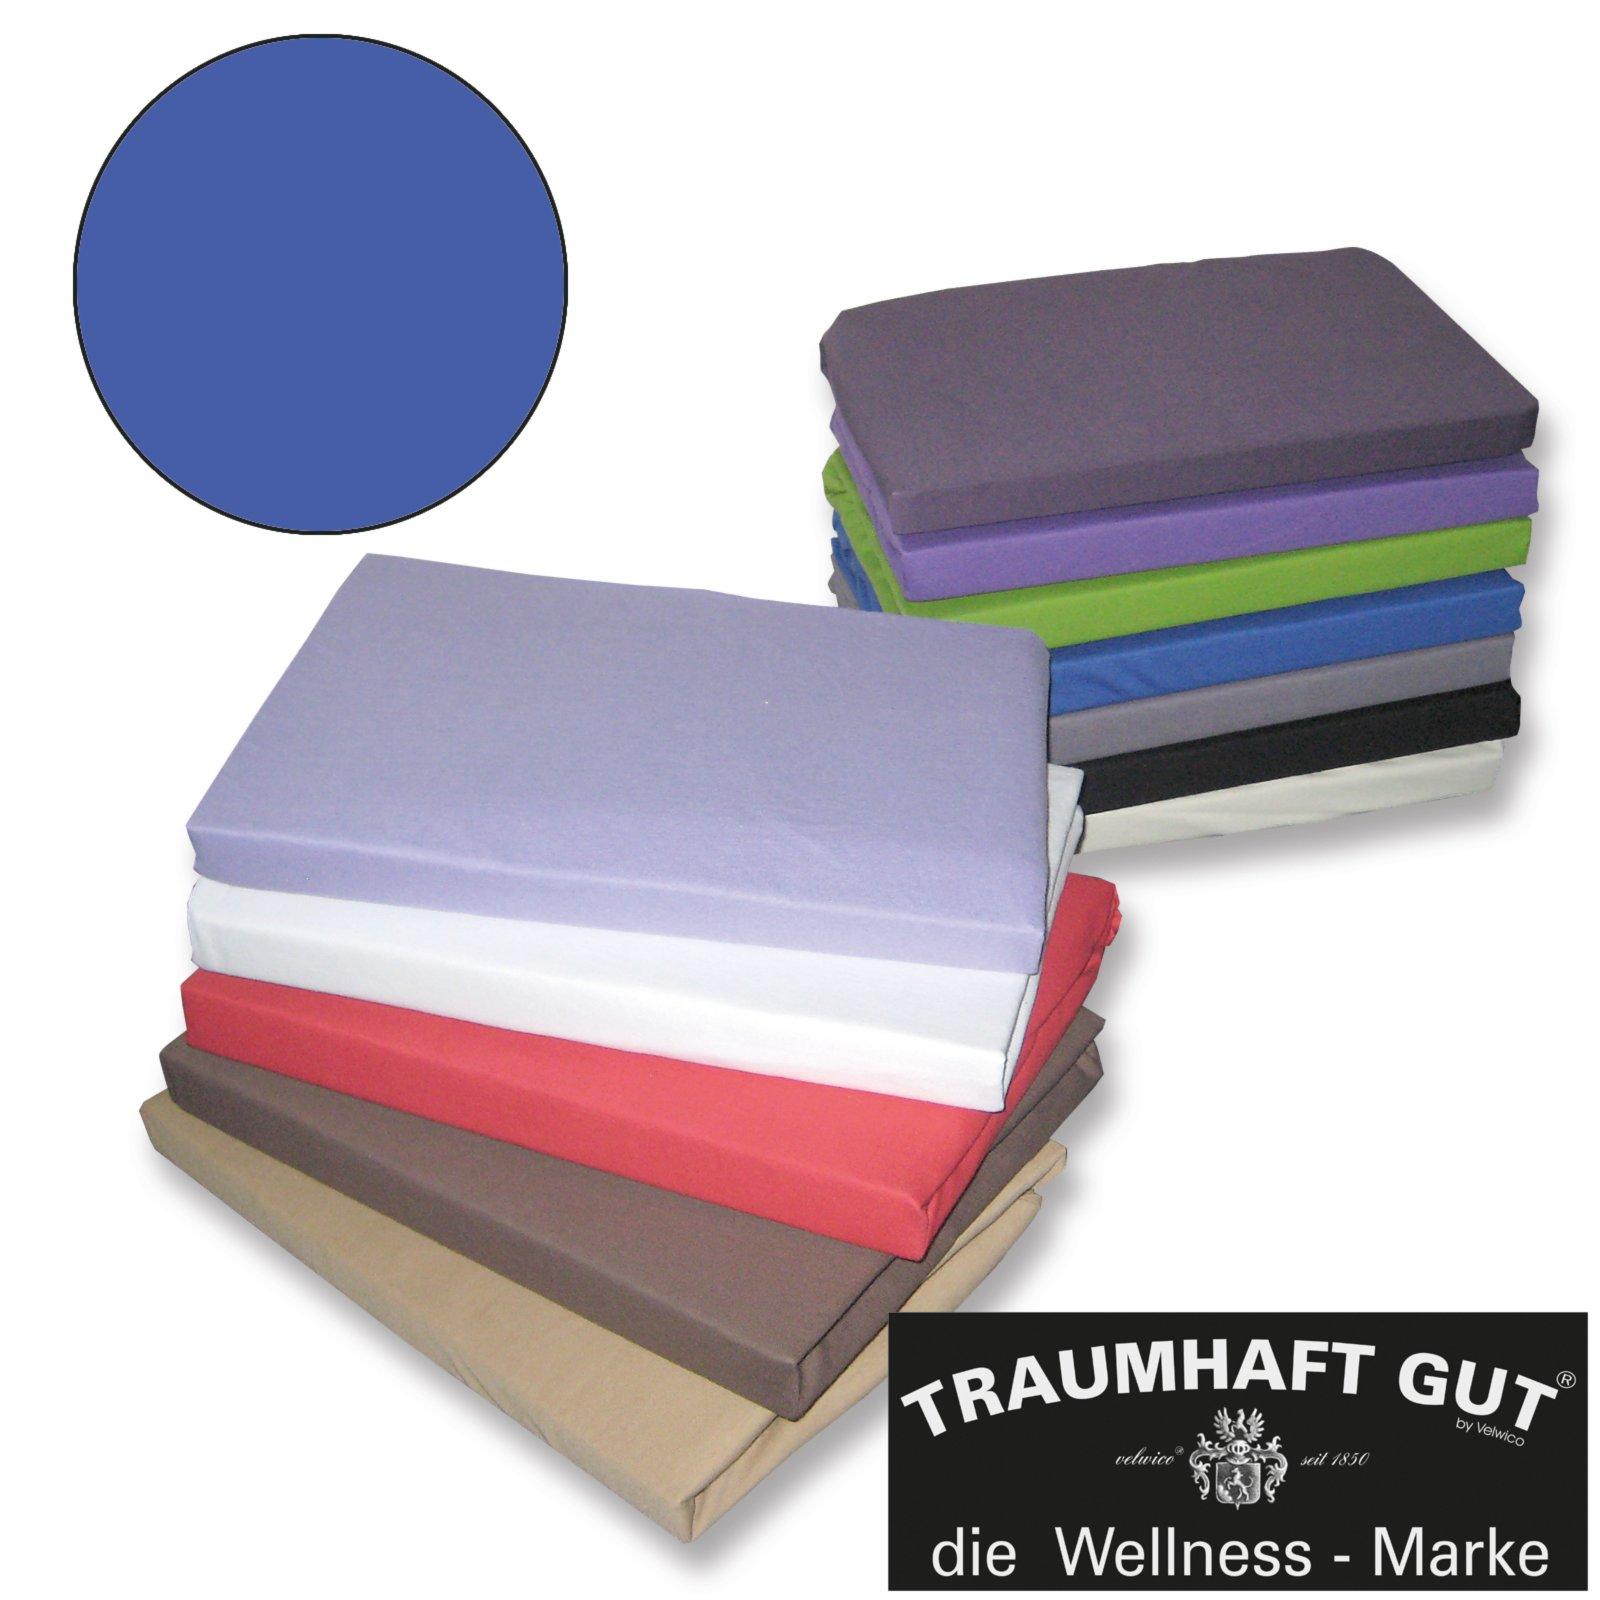 jersey spannbettlaken traumhaft gut blau 180x200 cm bettlaken bettw sche bettlaken. Black Bedroom Furniture Sets. Home Design Ideas